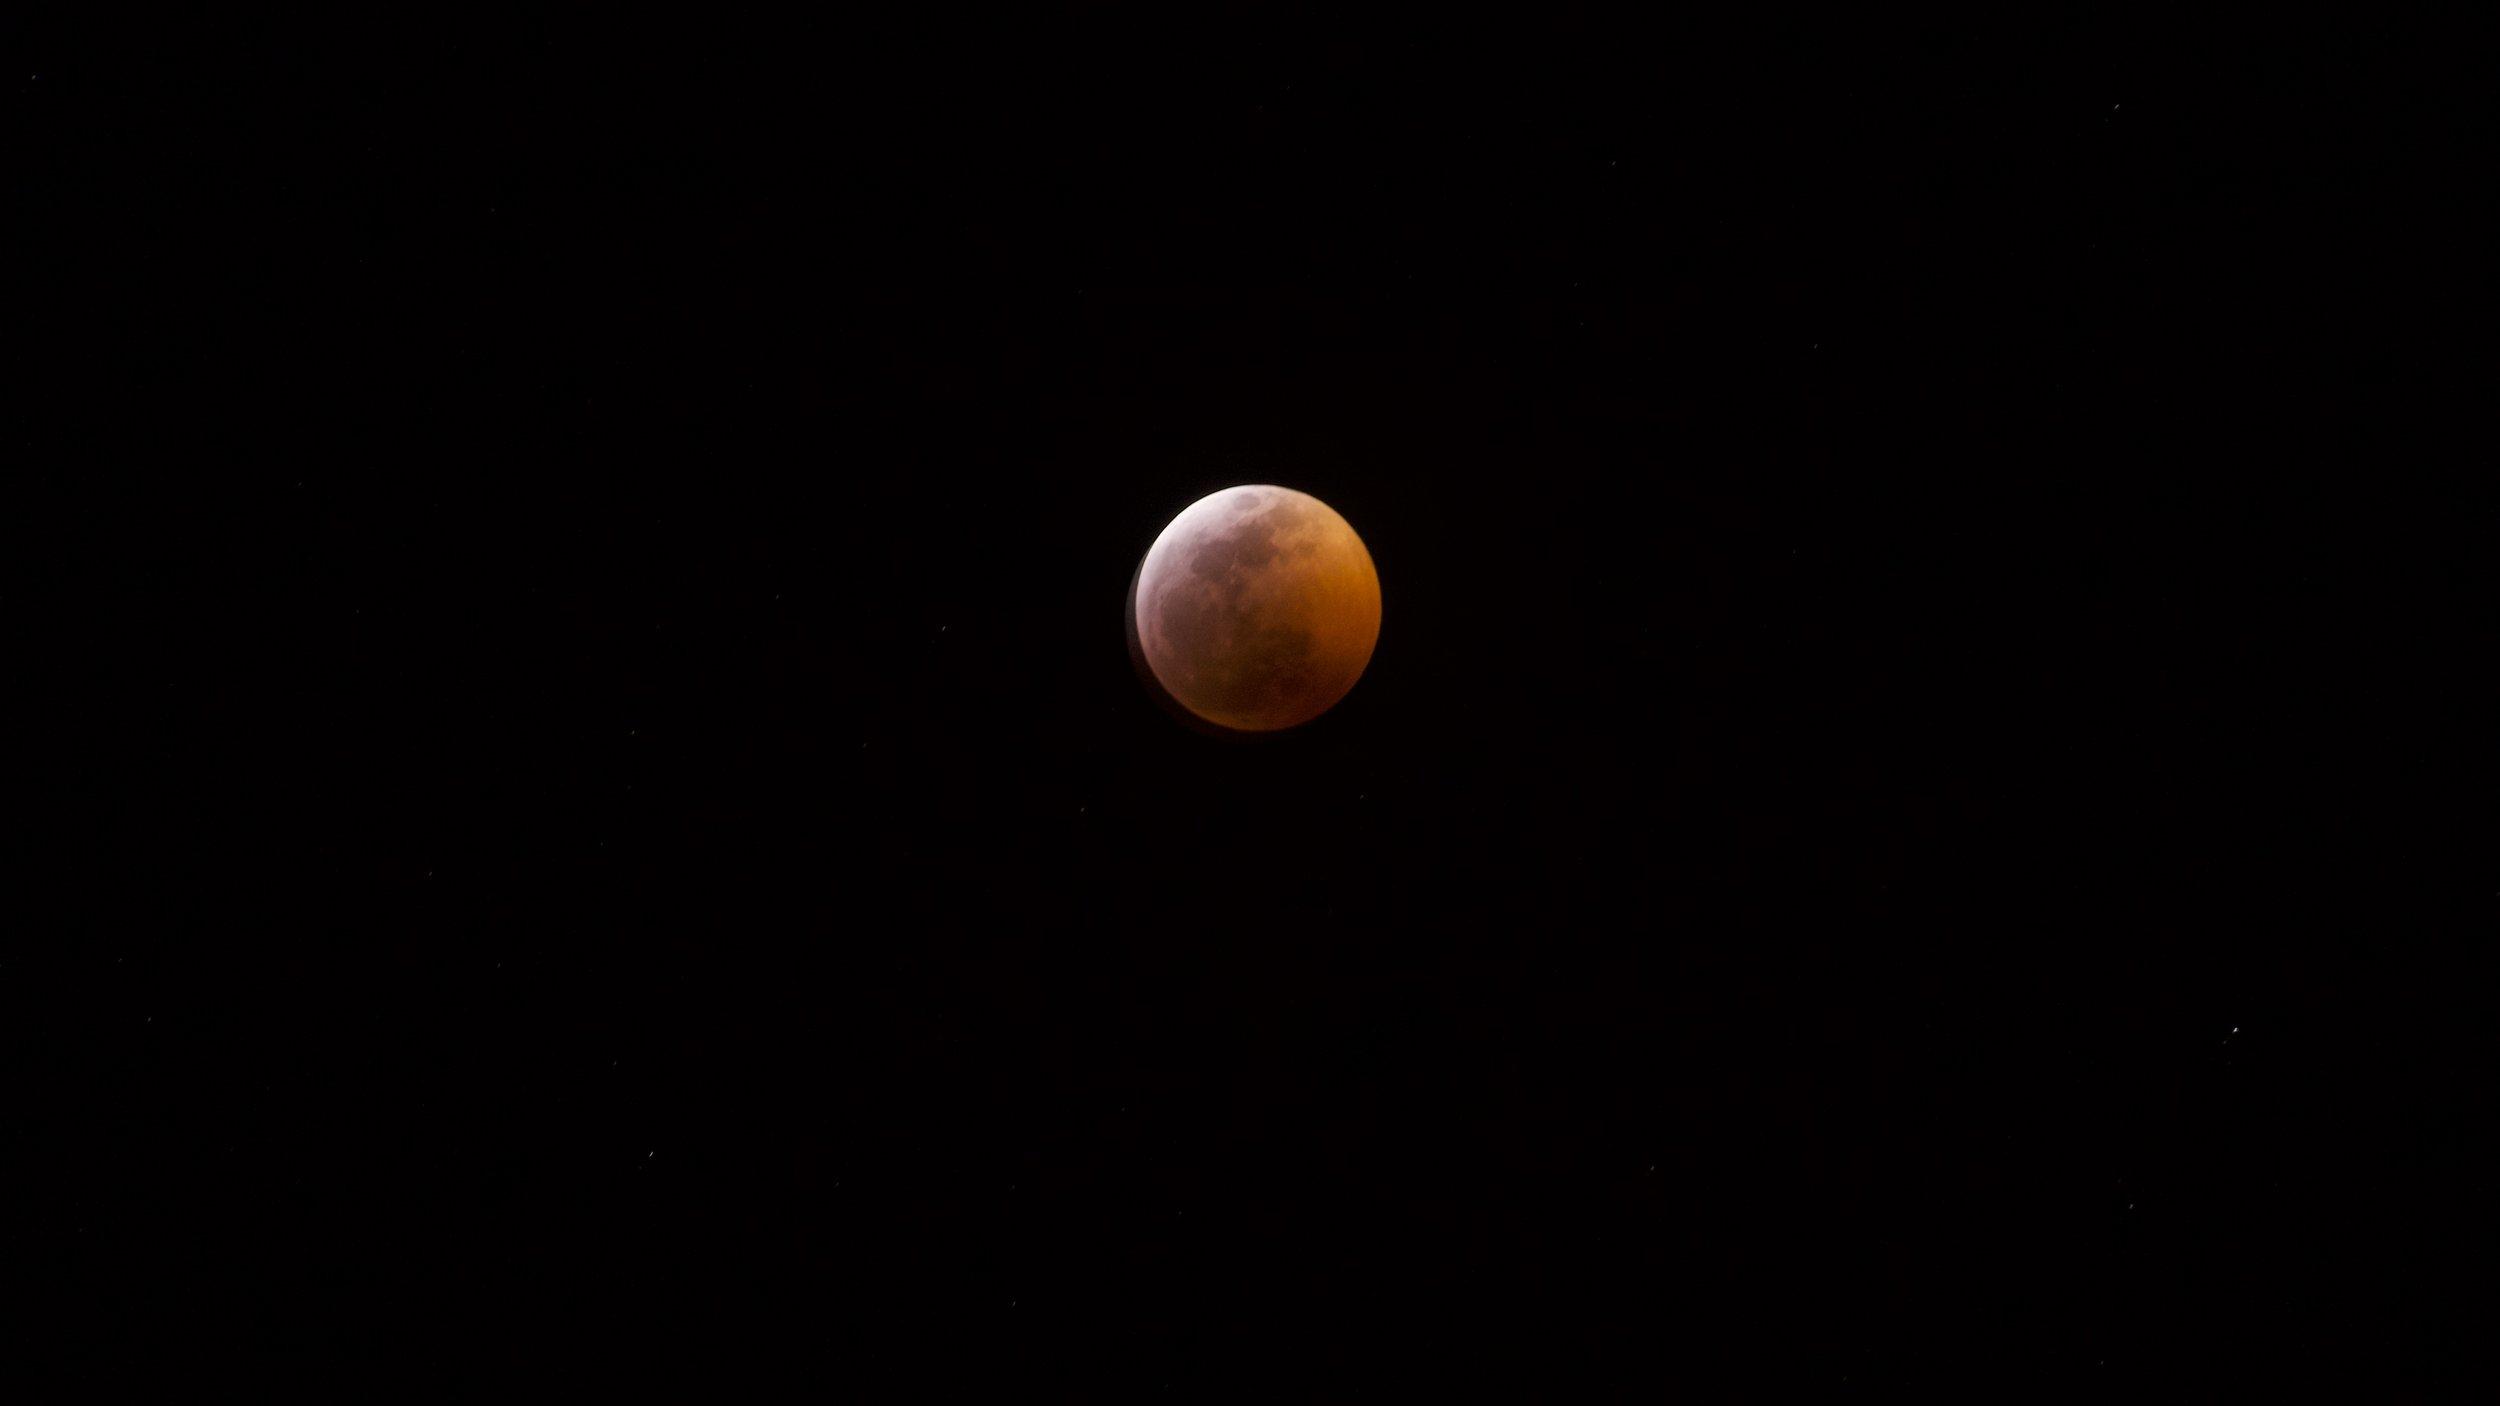 Recent Lunar Eclipse - January 2019